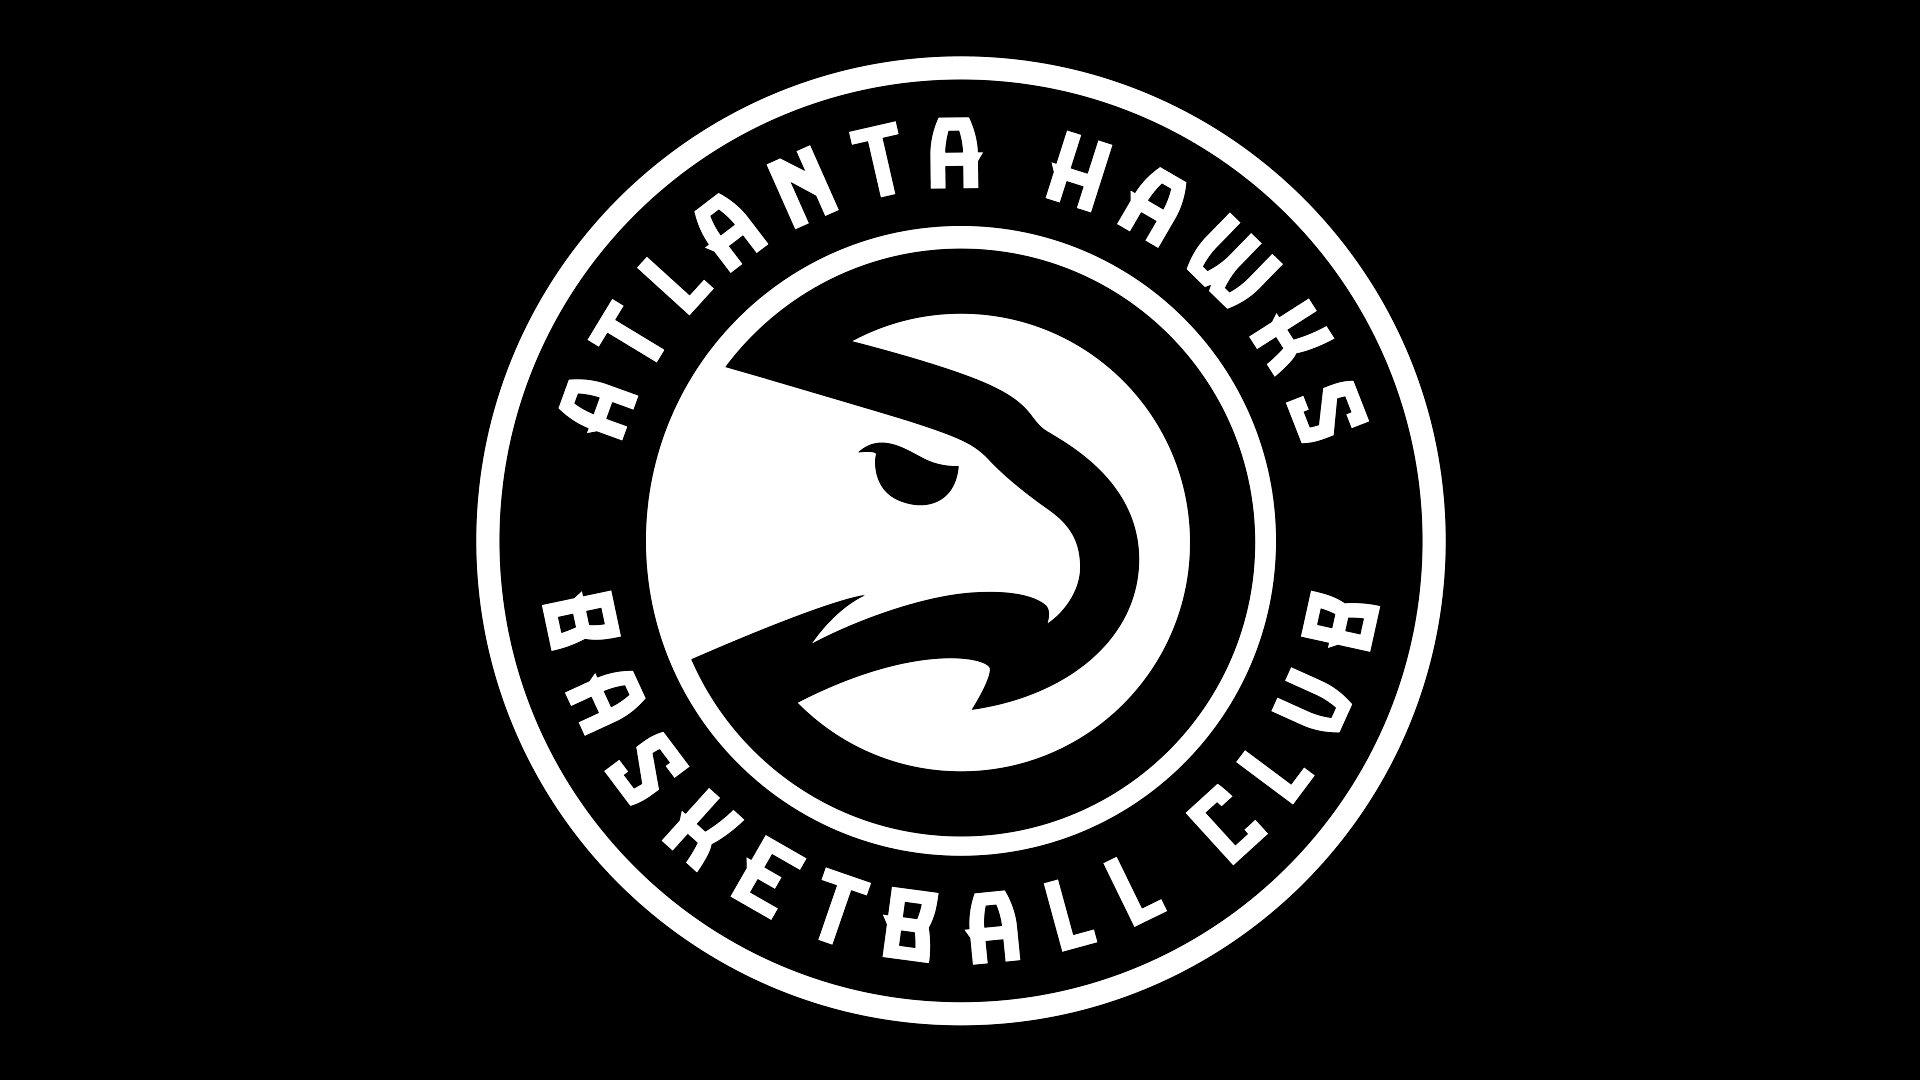 Atlanta hawks logo atlanta hawks symbol meaning history and the 2015 emblem atlanta hawks buycottarizona